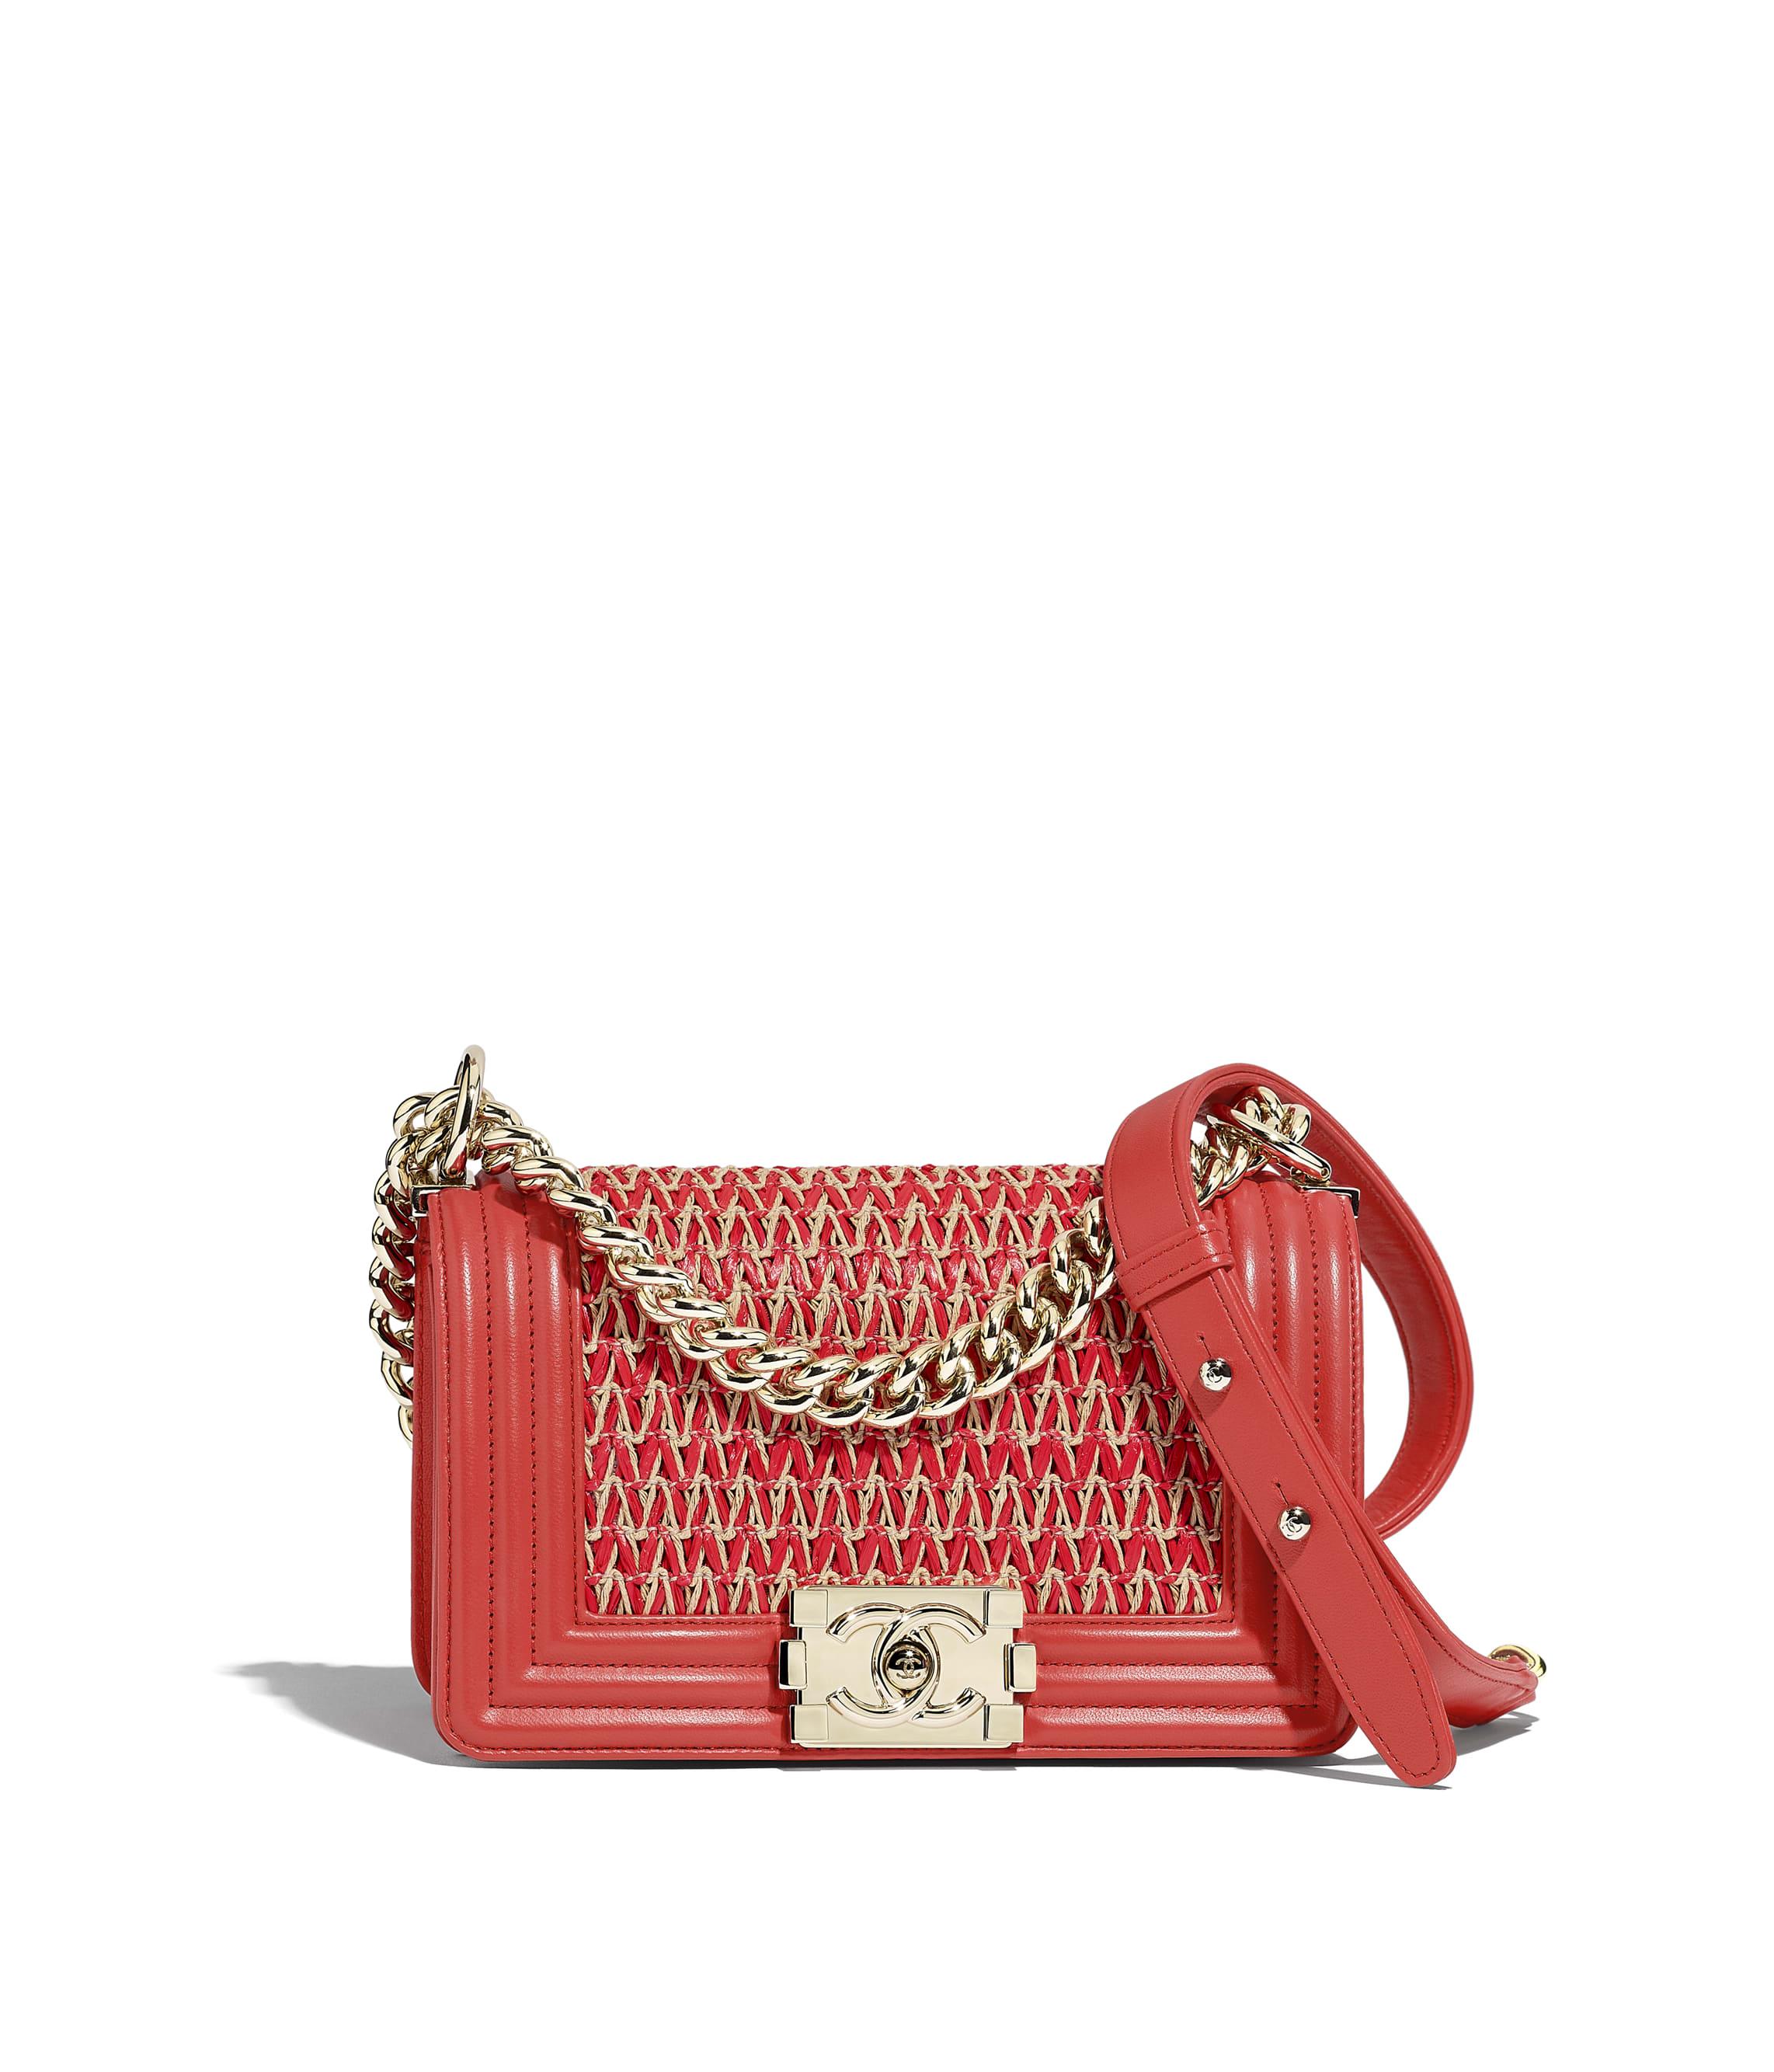 5e64e5d21c896 BOY CHANEL - Handbags - CHANEL